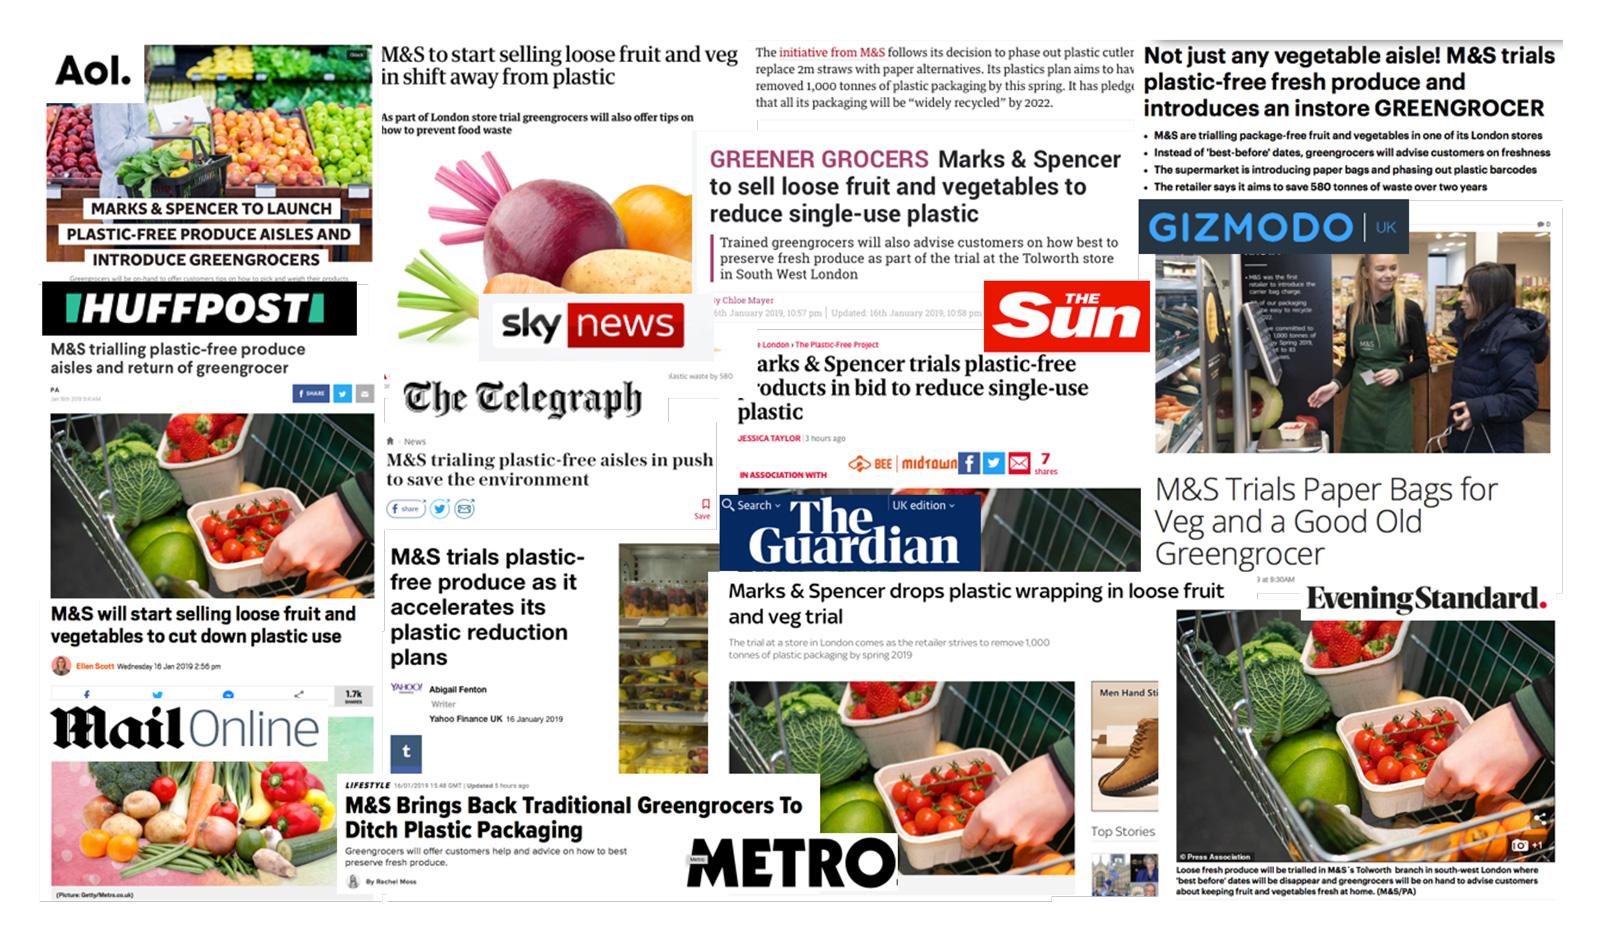 M&S modern PR coverage